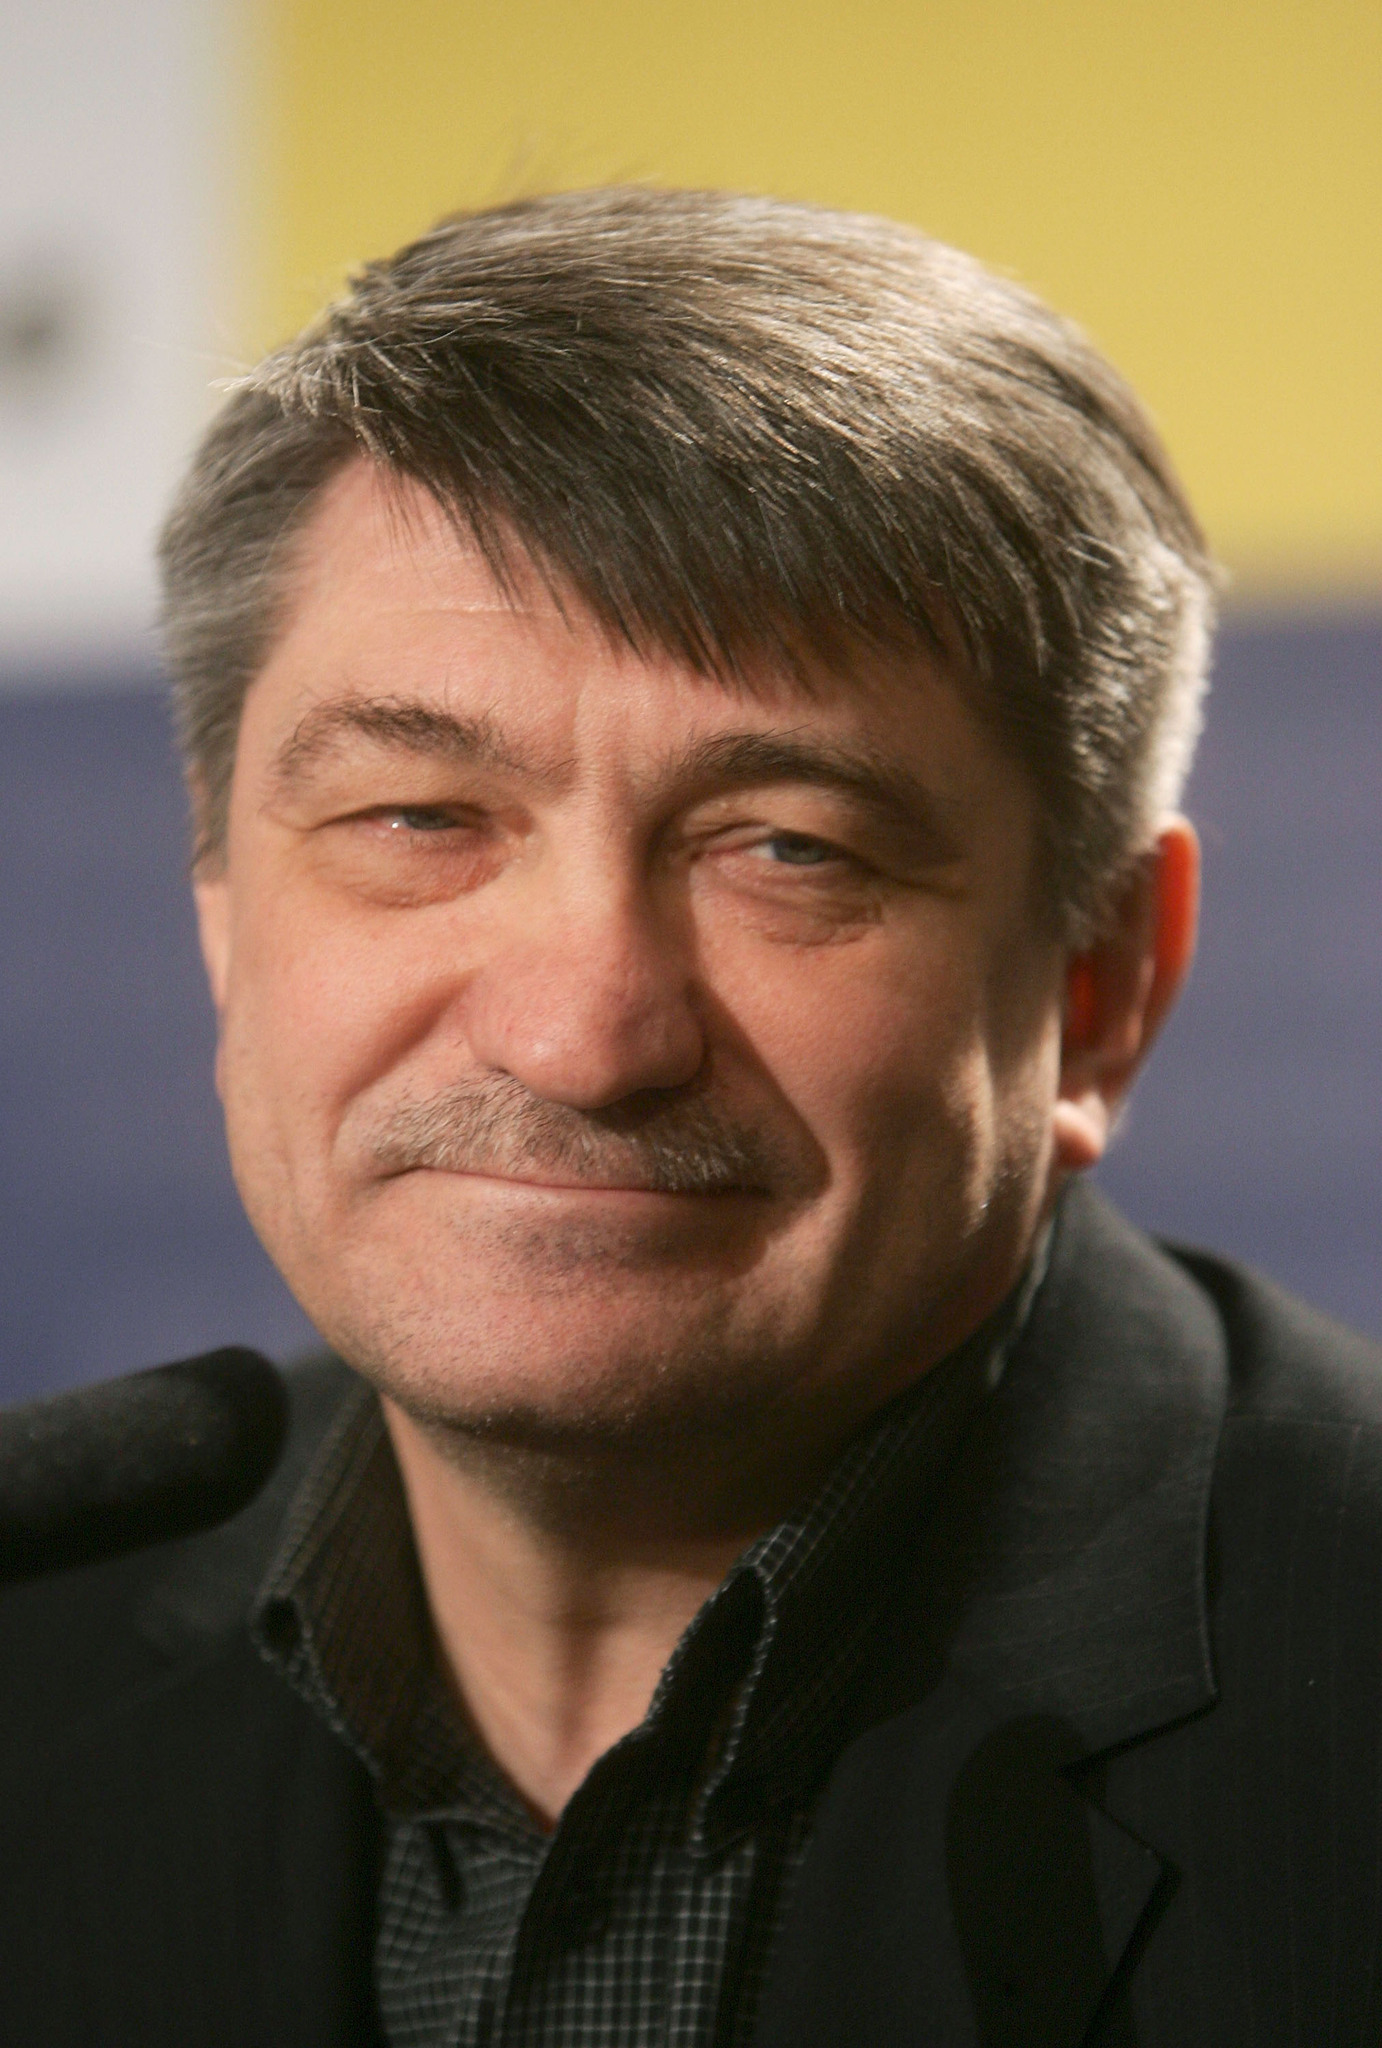 Timofey Tribuntsev now